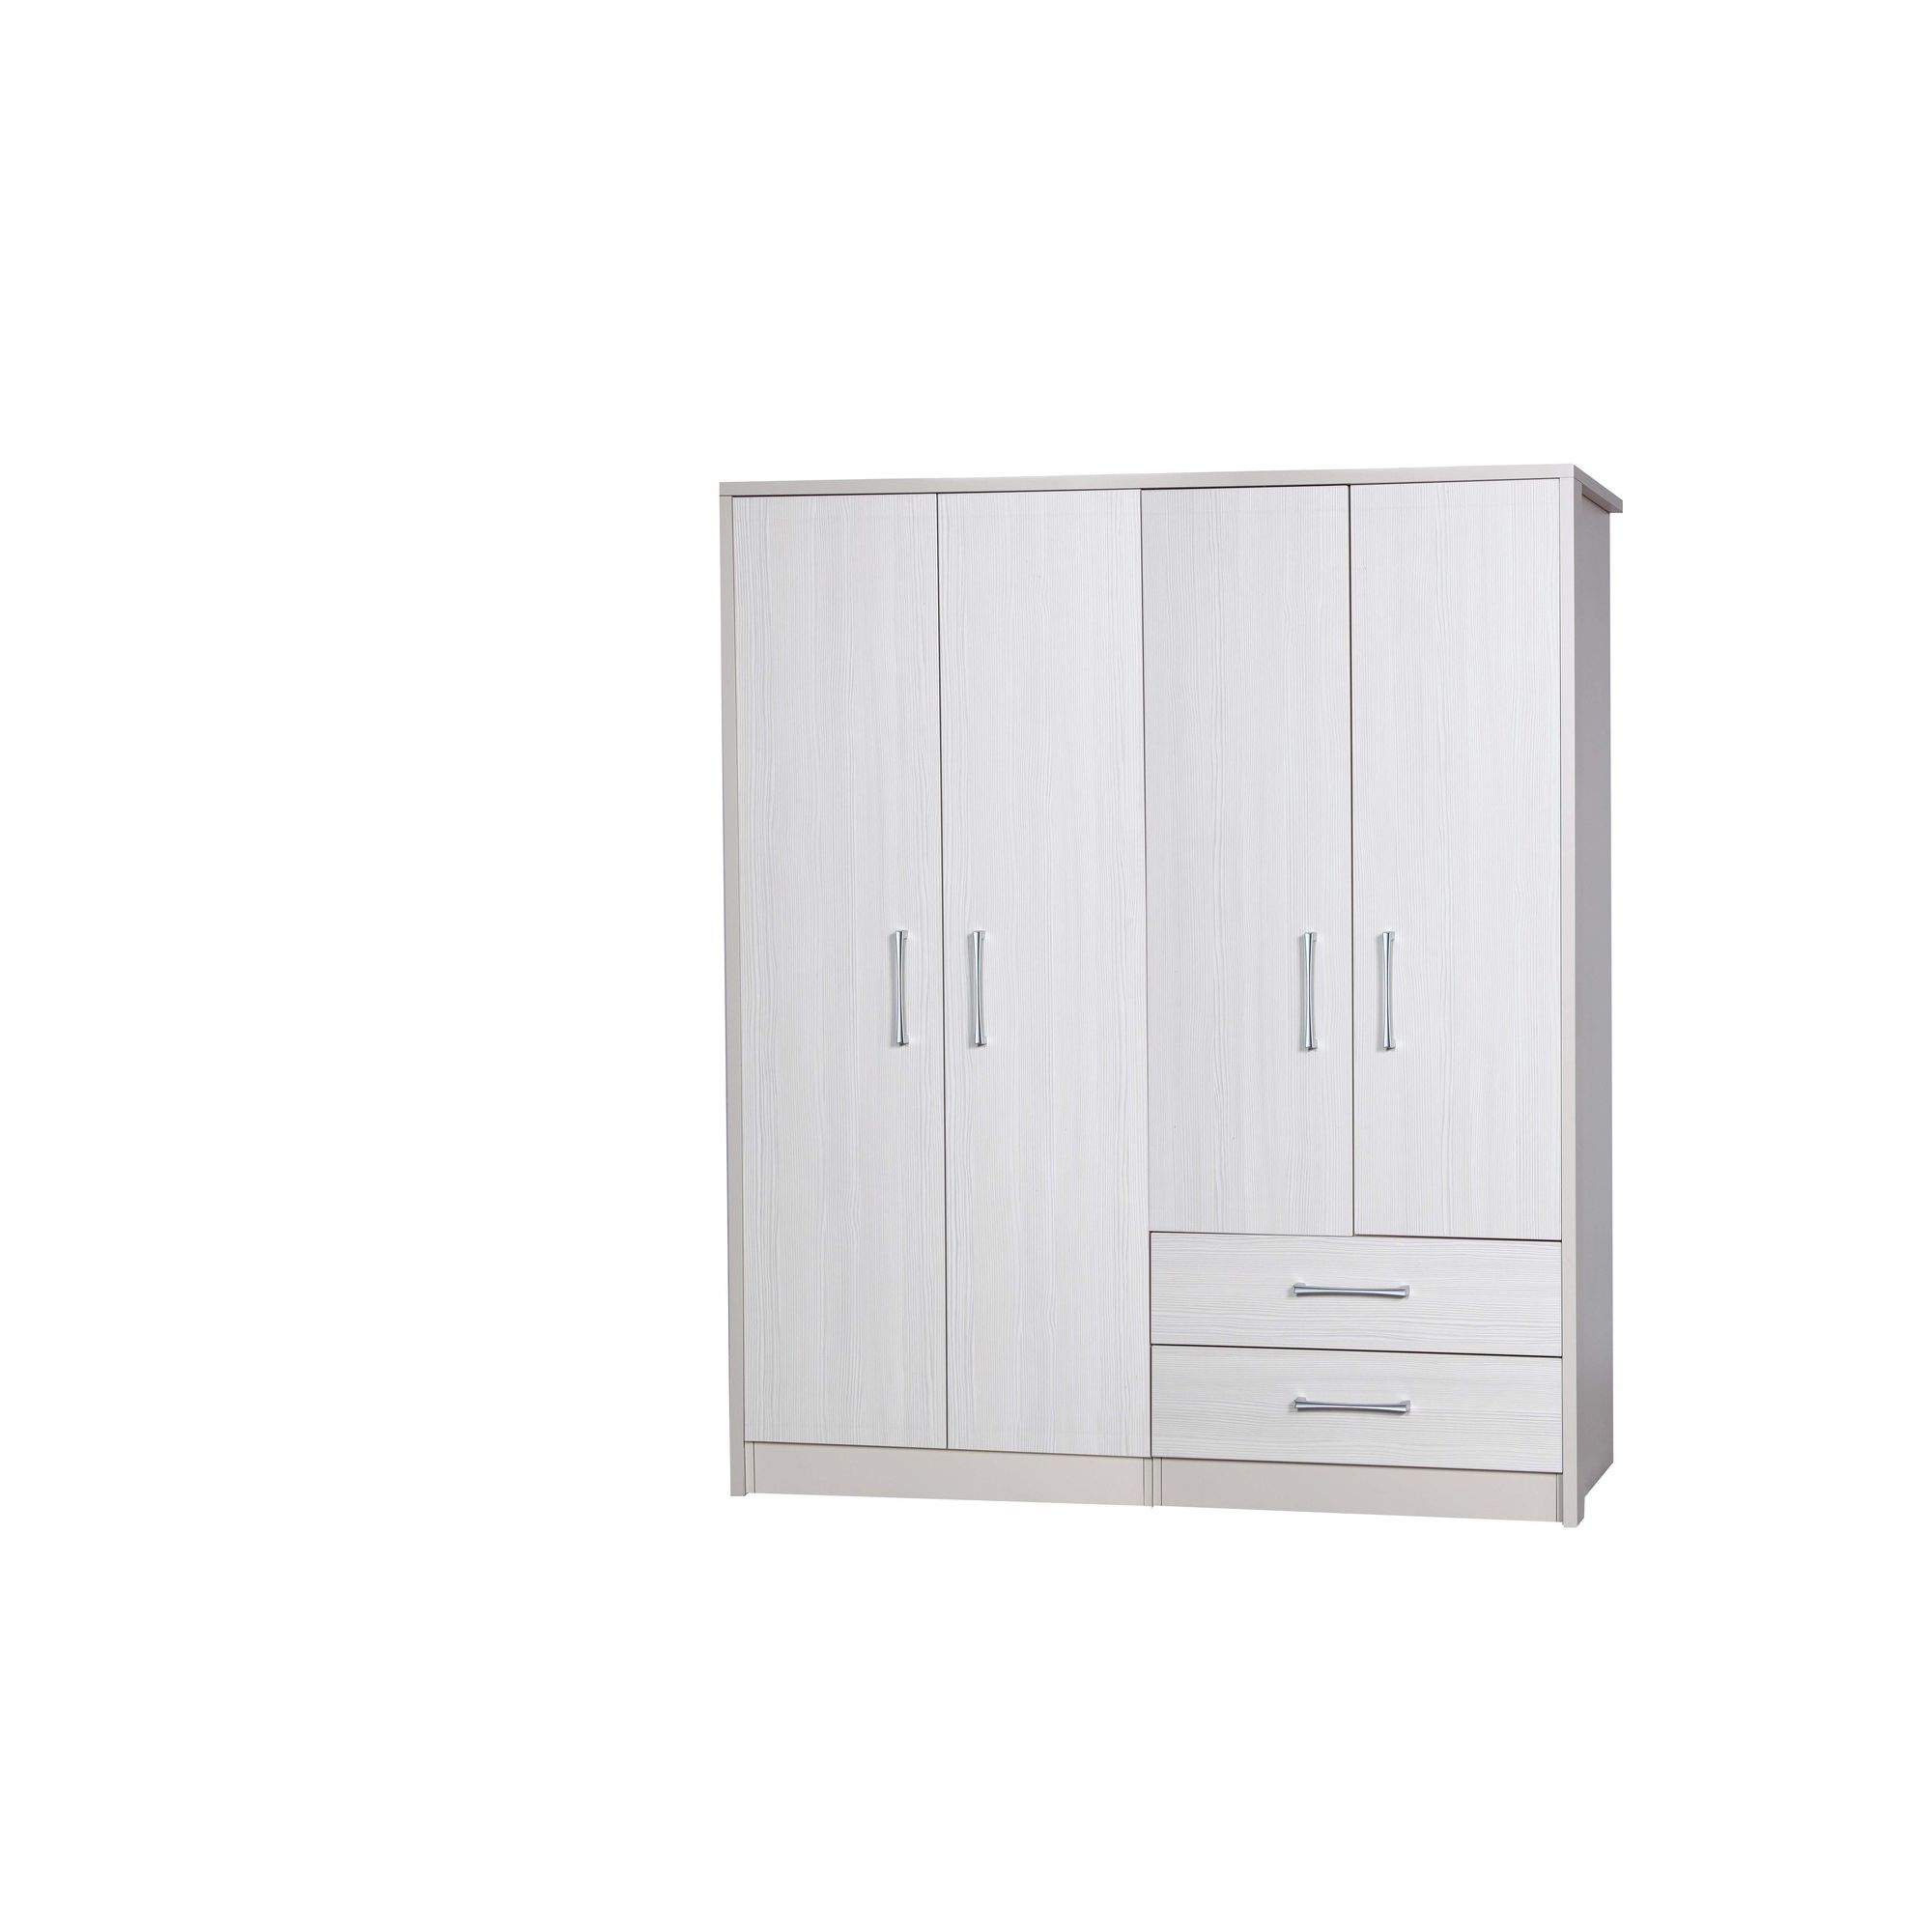 Alto Furniture Avola 4 Door Combi and Regular Wardrobe - Cream Carcass With White Avola at Tesco Direct